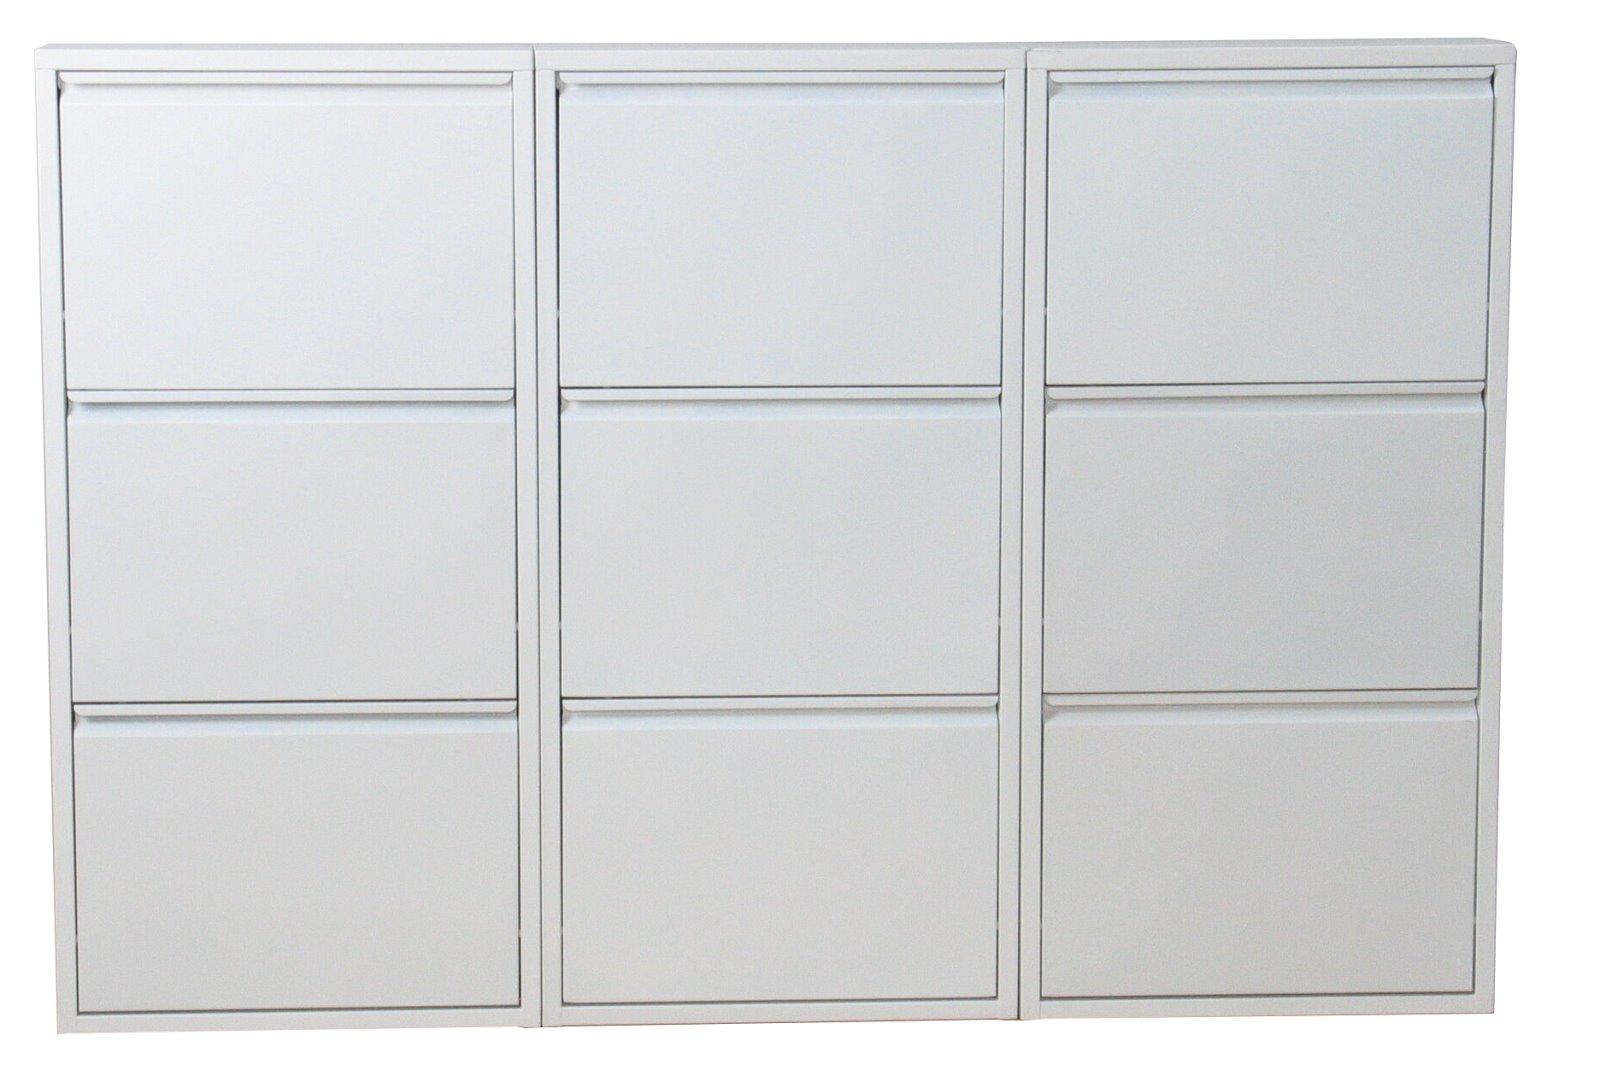 xxl schuhschrank pisa 9 klappen metall schuhkipper. Black Bedroom Furniture Sets. Home Design Ideas